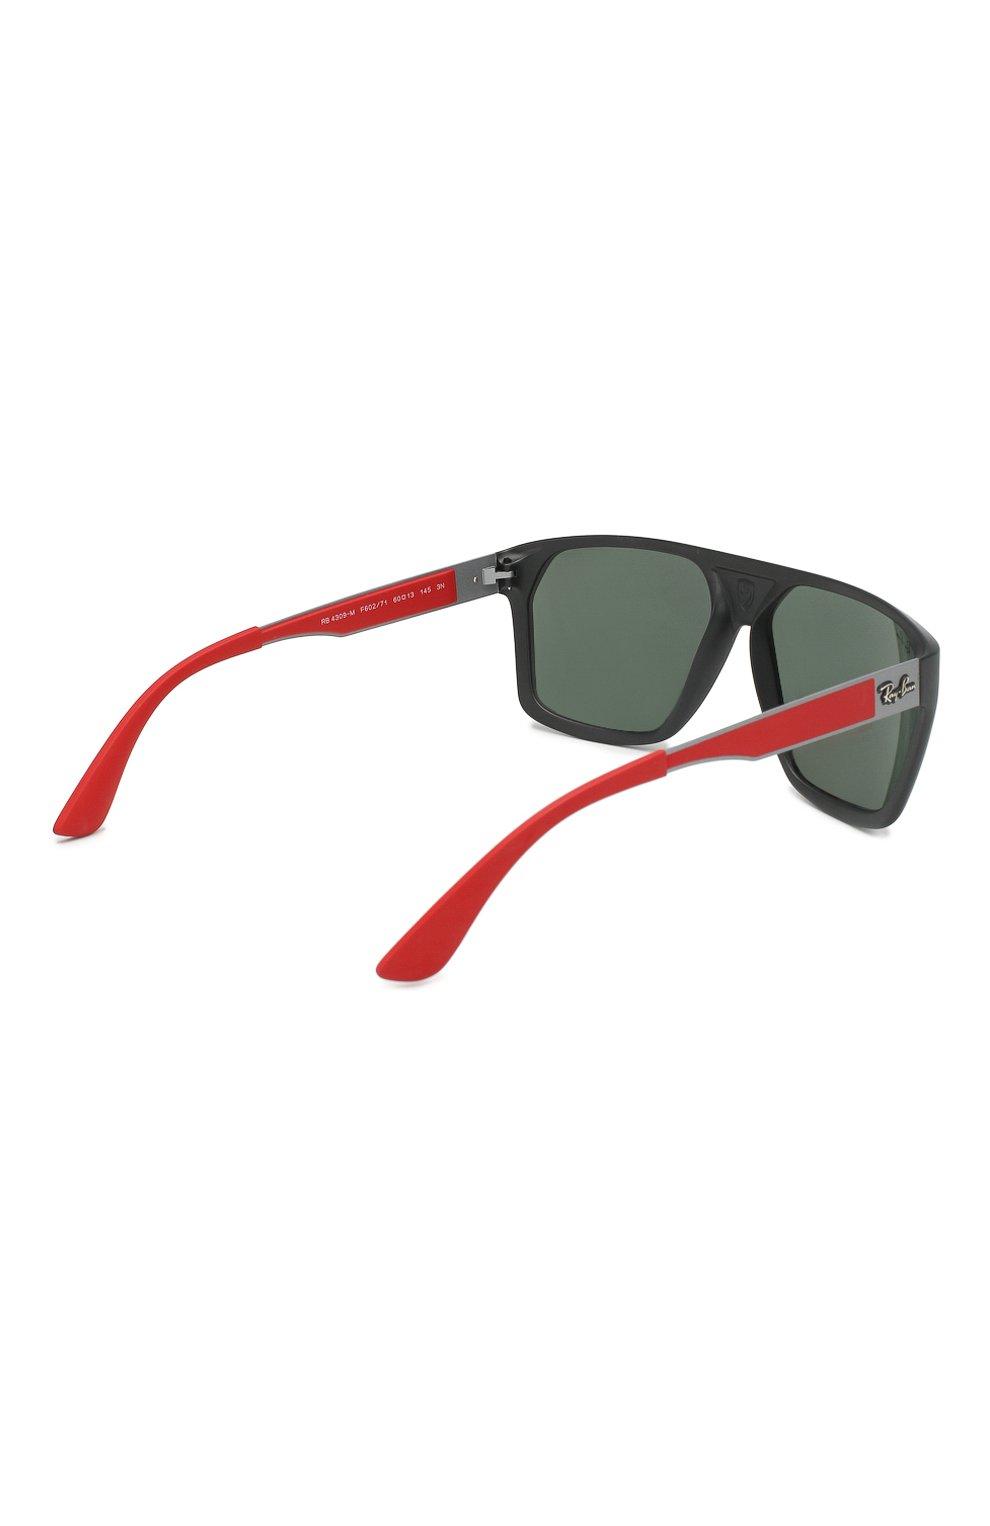 Мужские солнцезащитные очки RAY-BAN черного цвета, арт. 4309M-F60271 | Фото 3